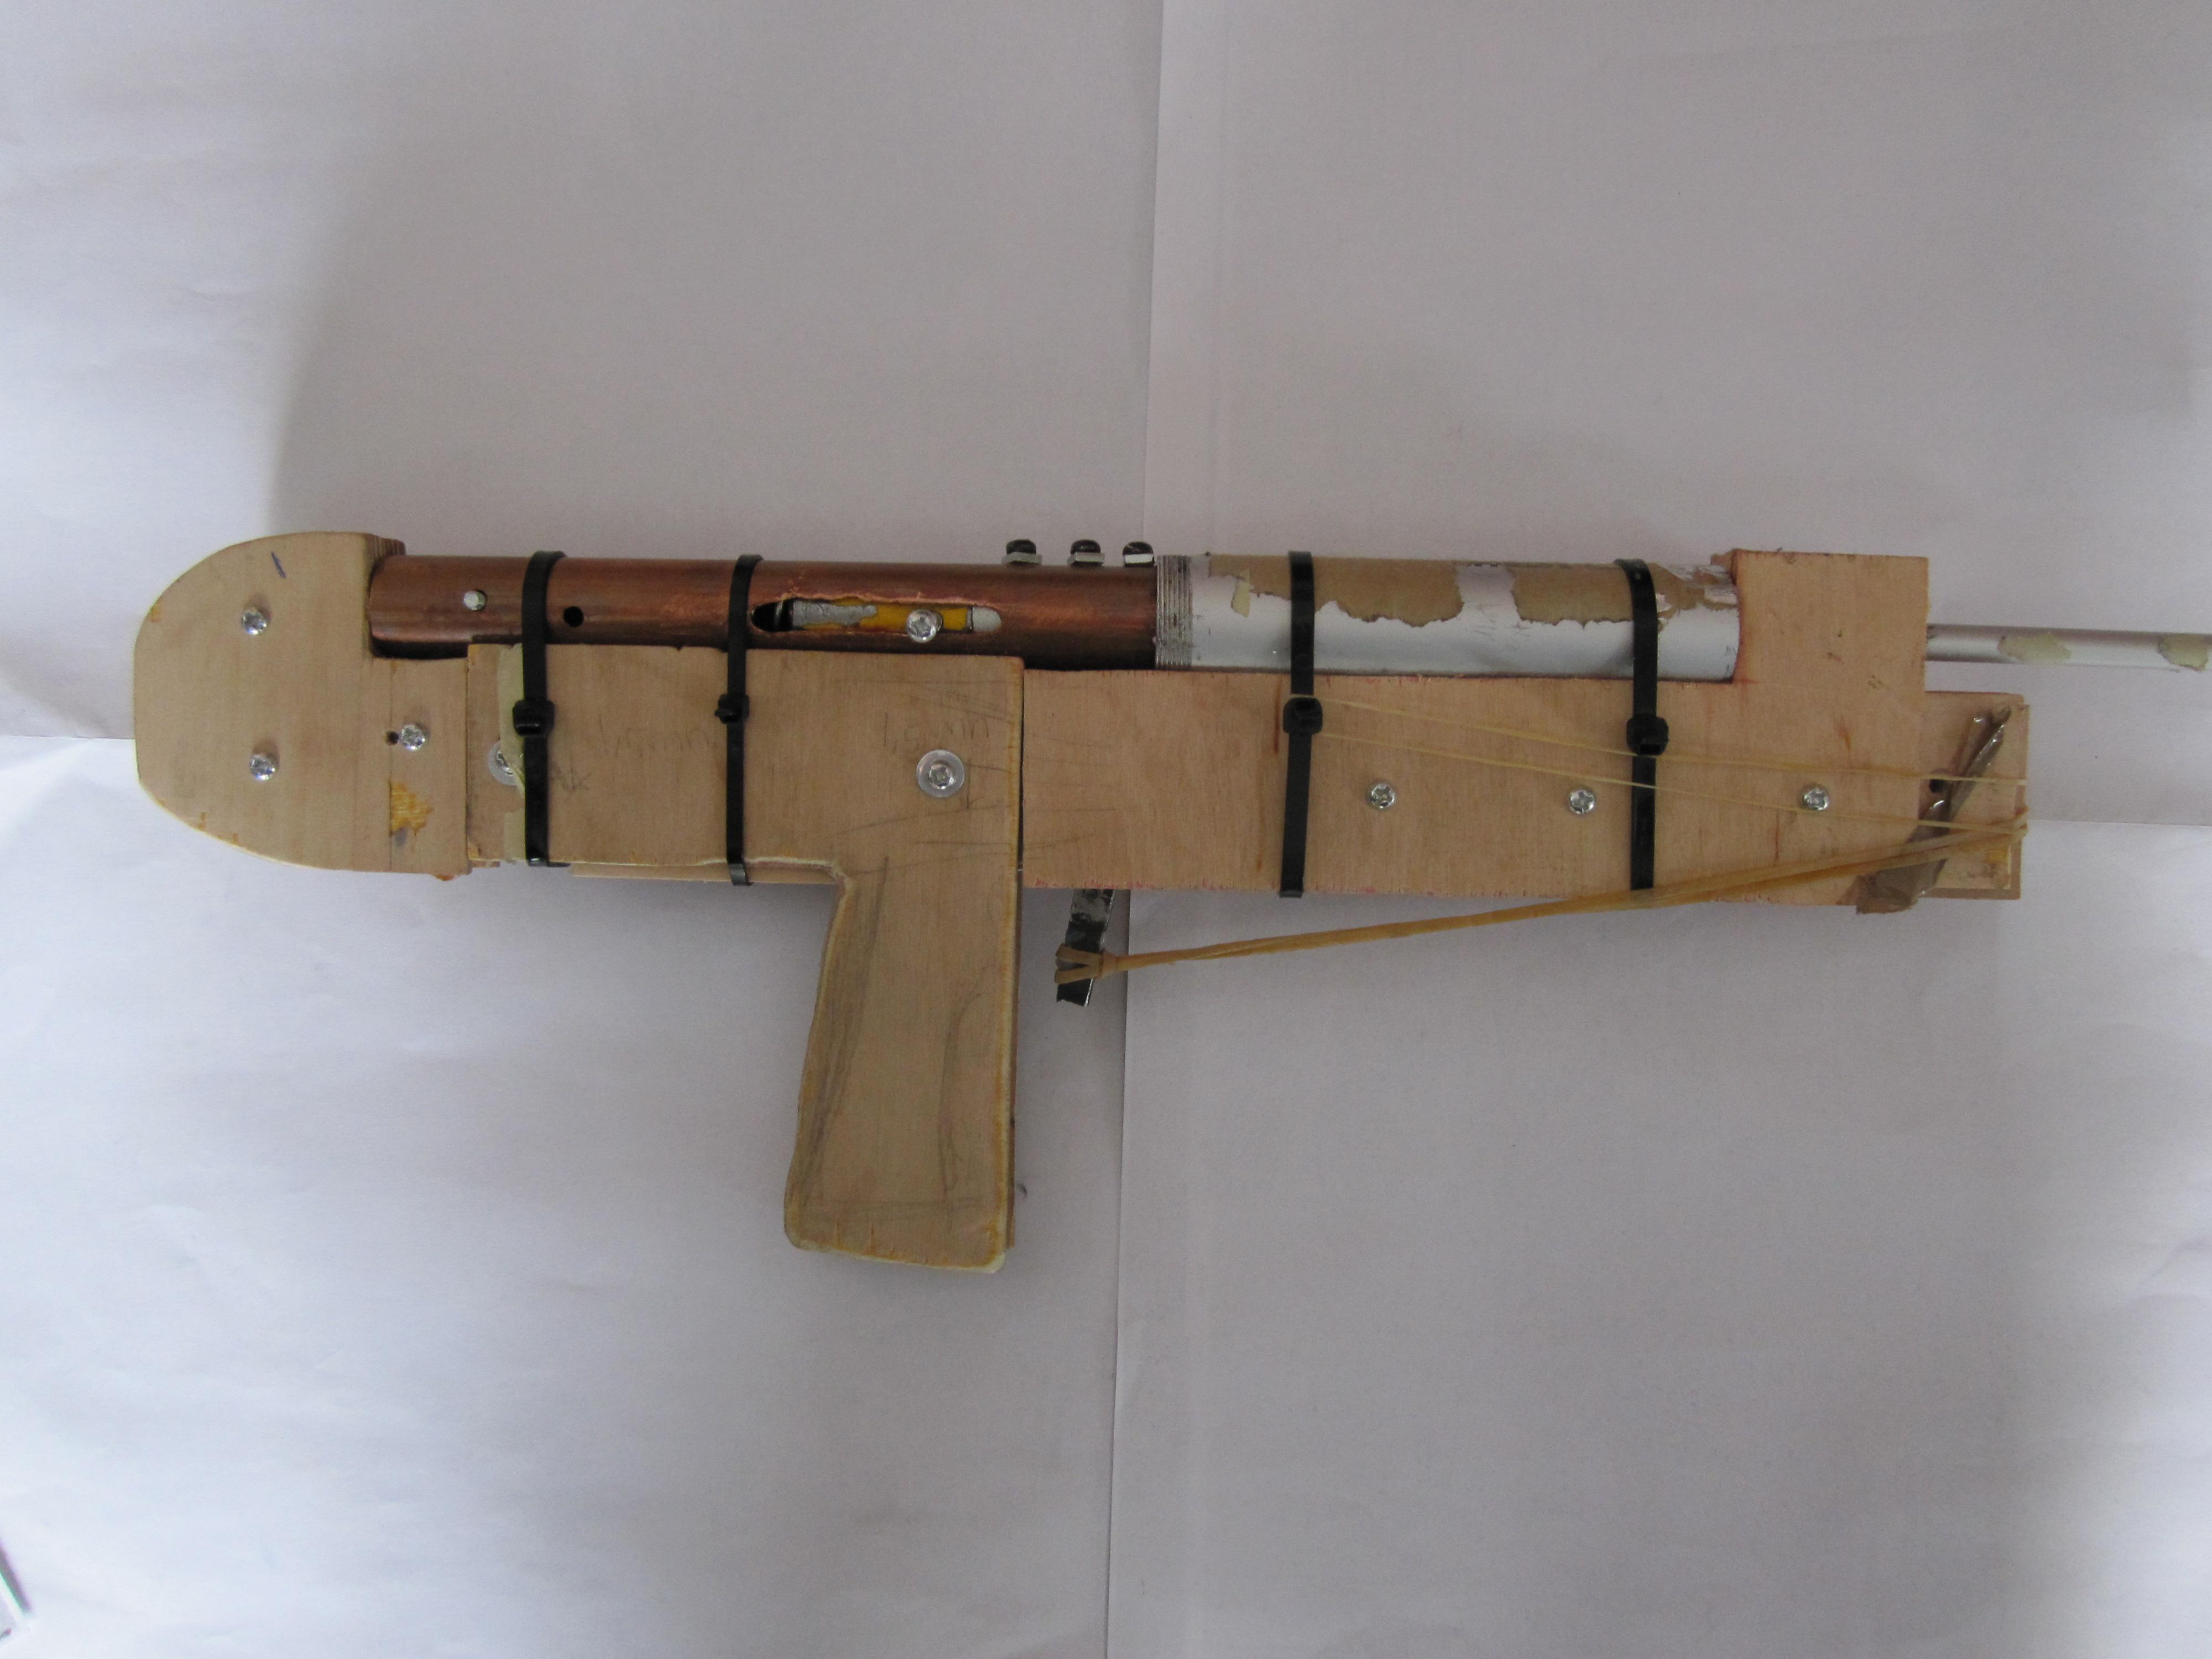 How to make a very powerful BB gun